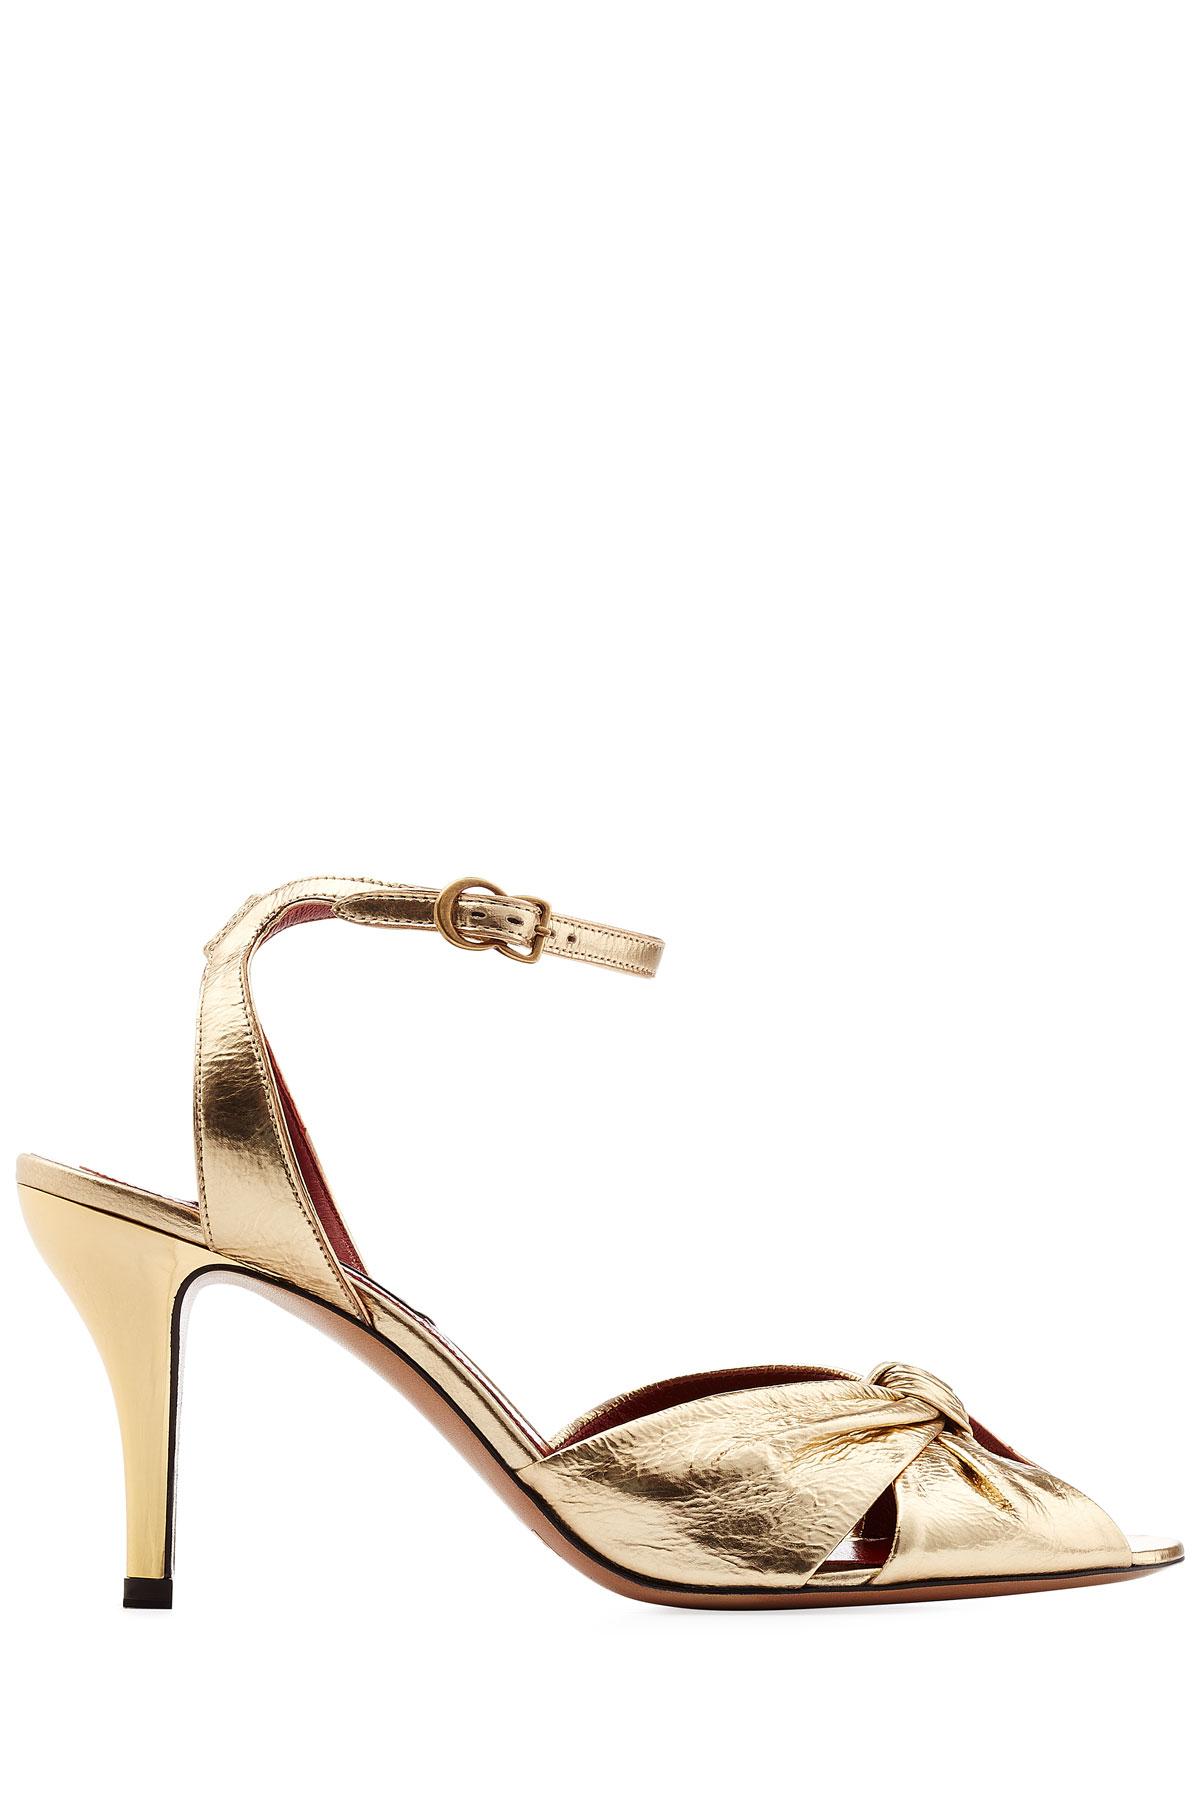 8da63cd2c6b Marc Jacobs Metallic Leather Sandals - Gold in Metallic - Lyst